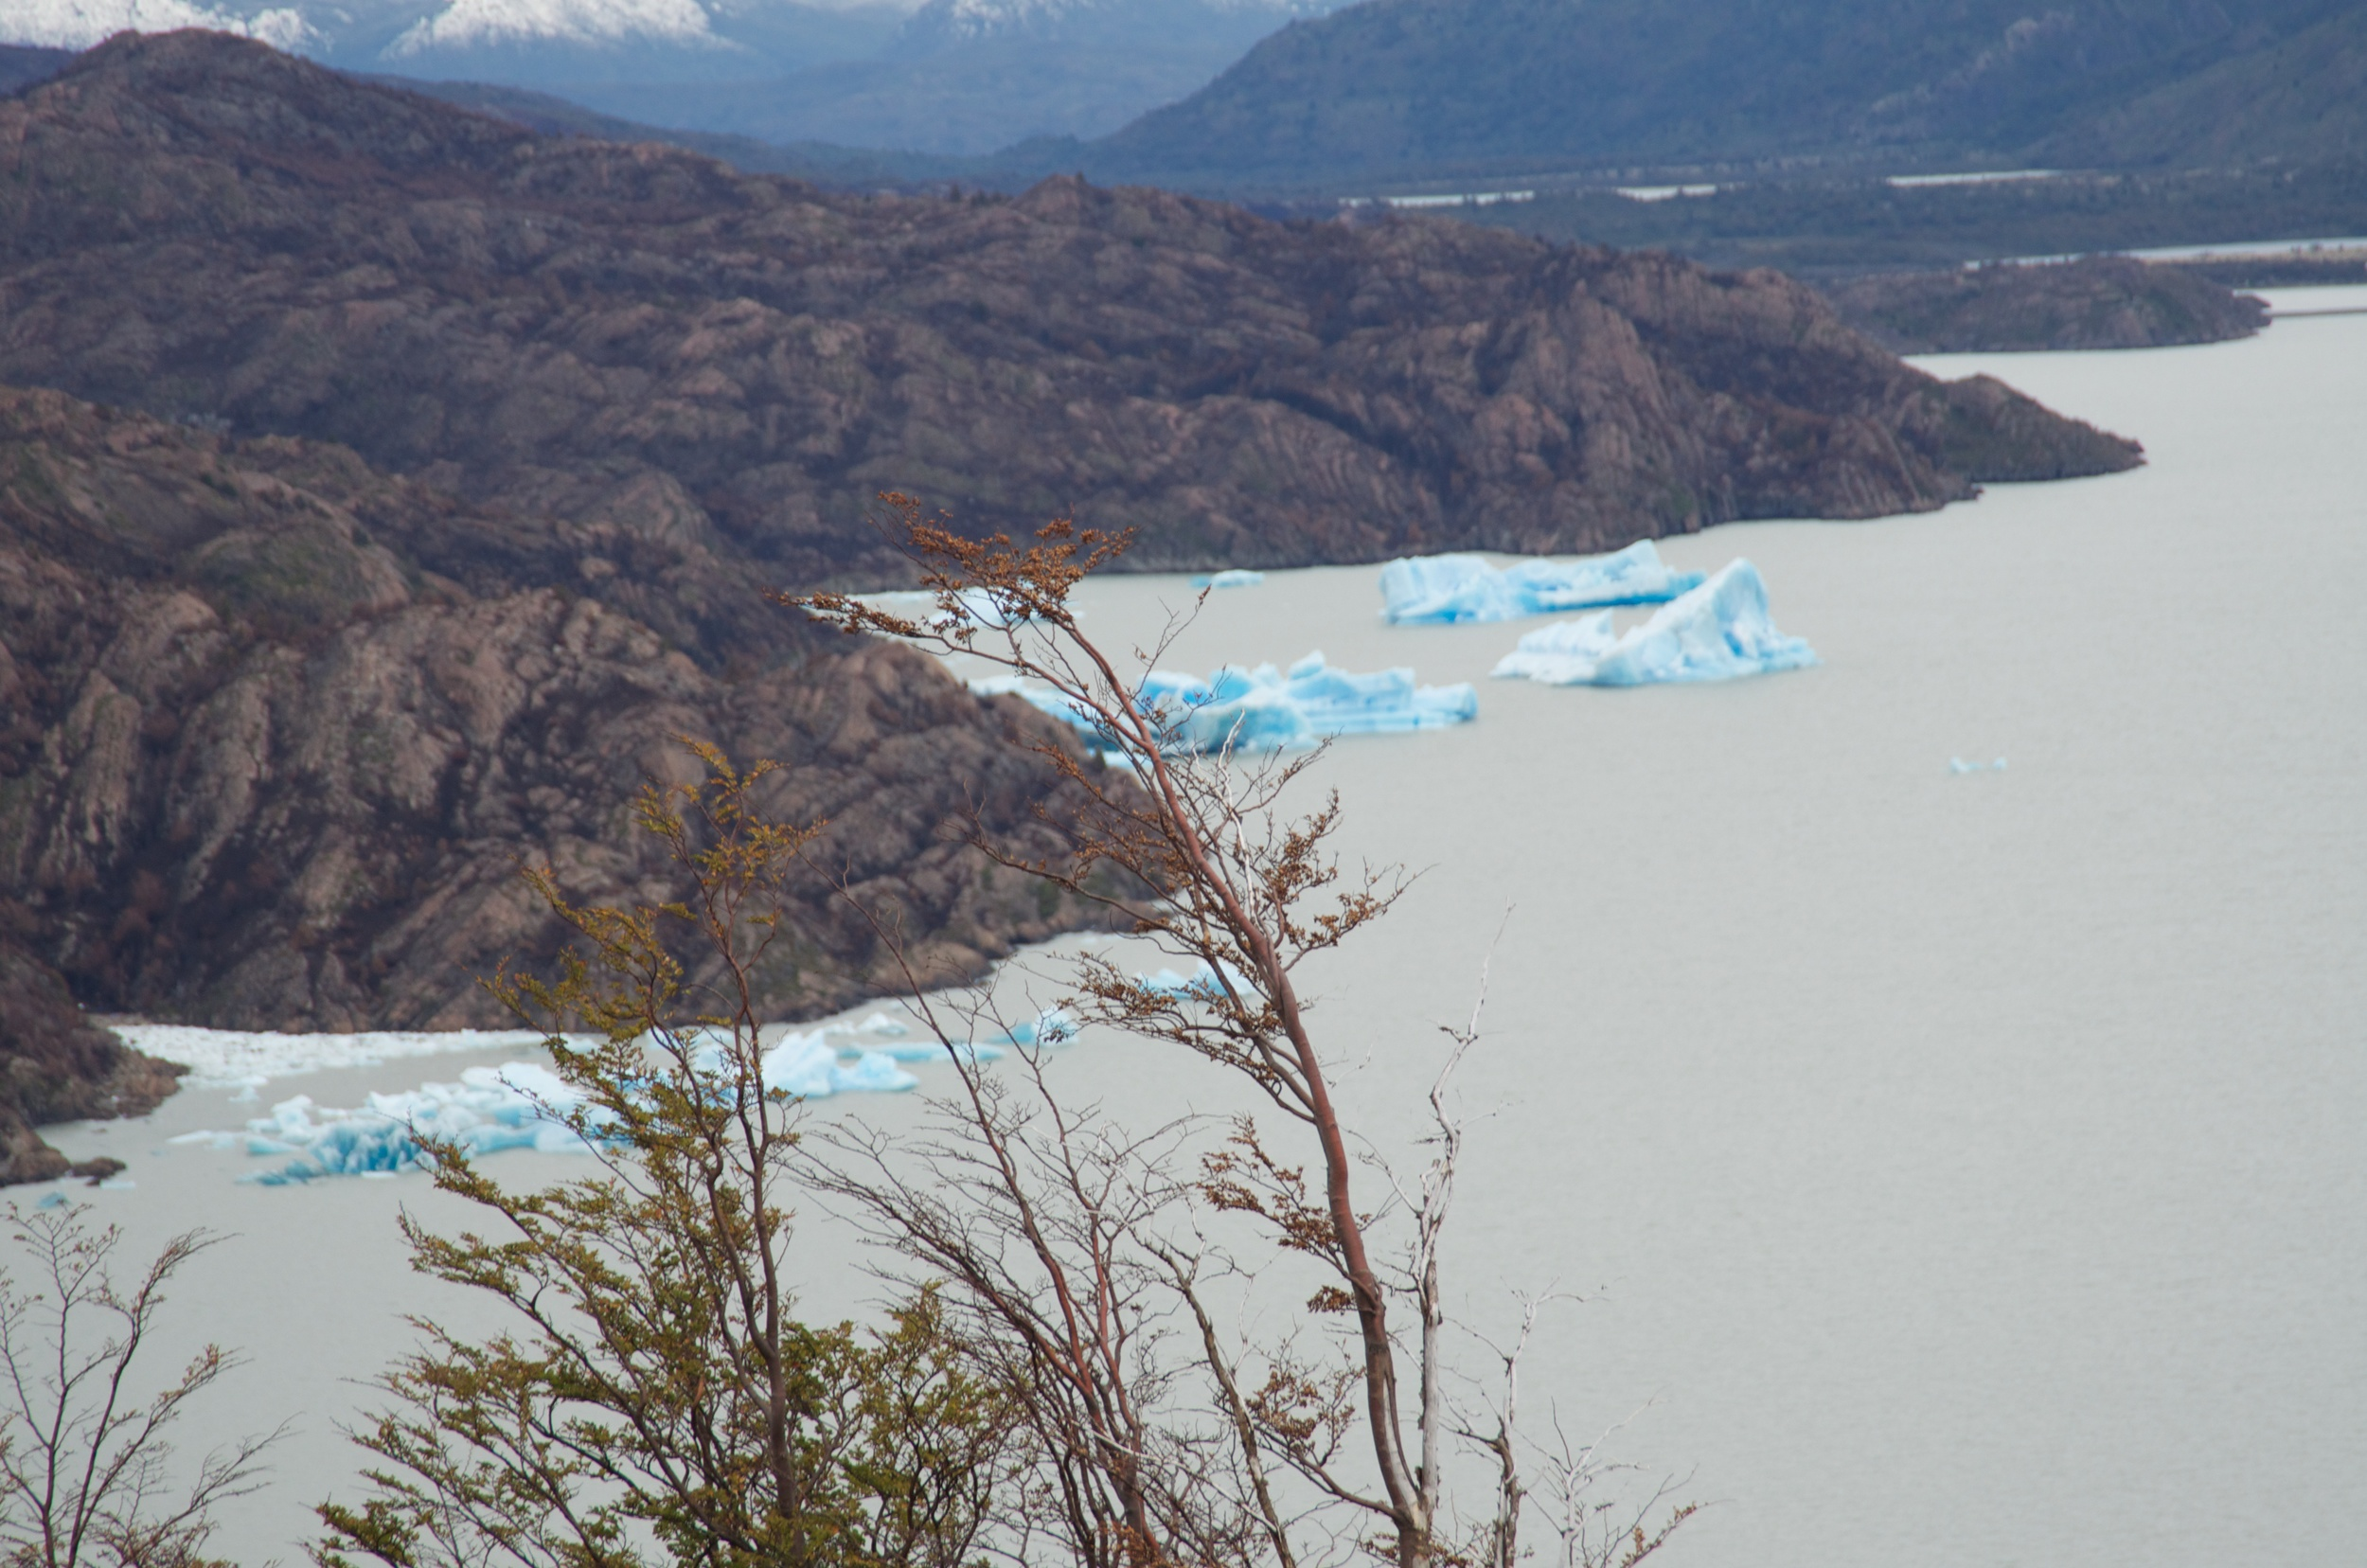 Icebergs on Lago Grey, Torres del Paine, Patagonia, Chile, 6 Apr 2012